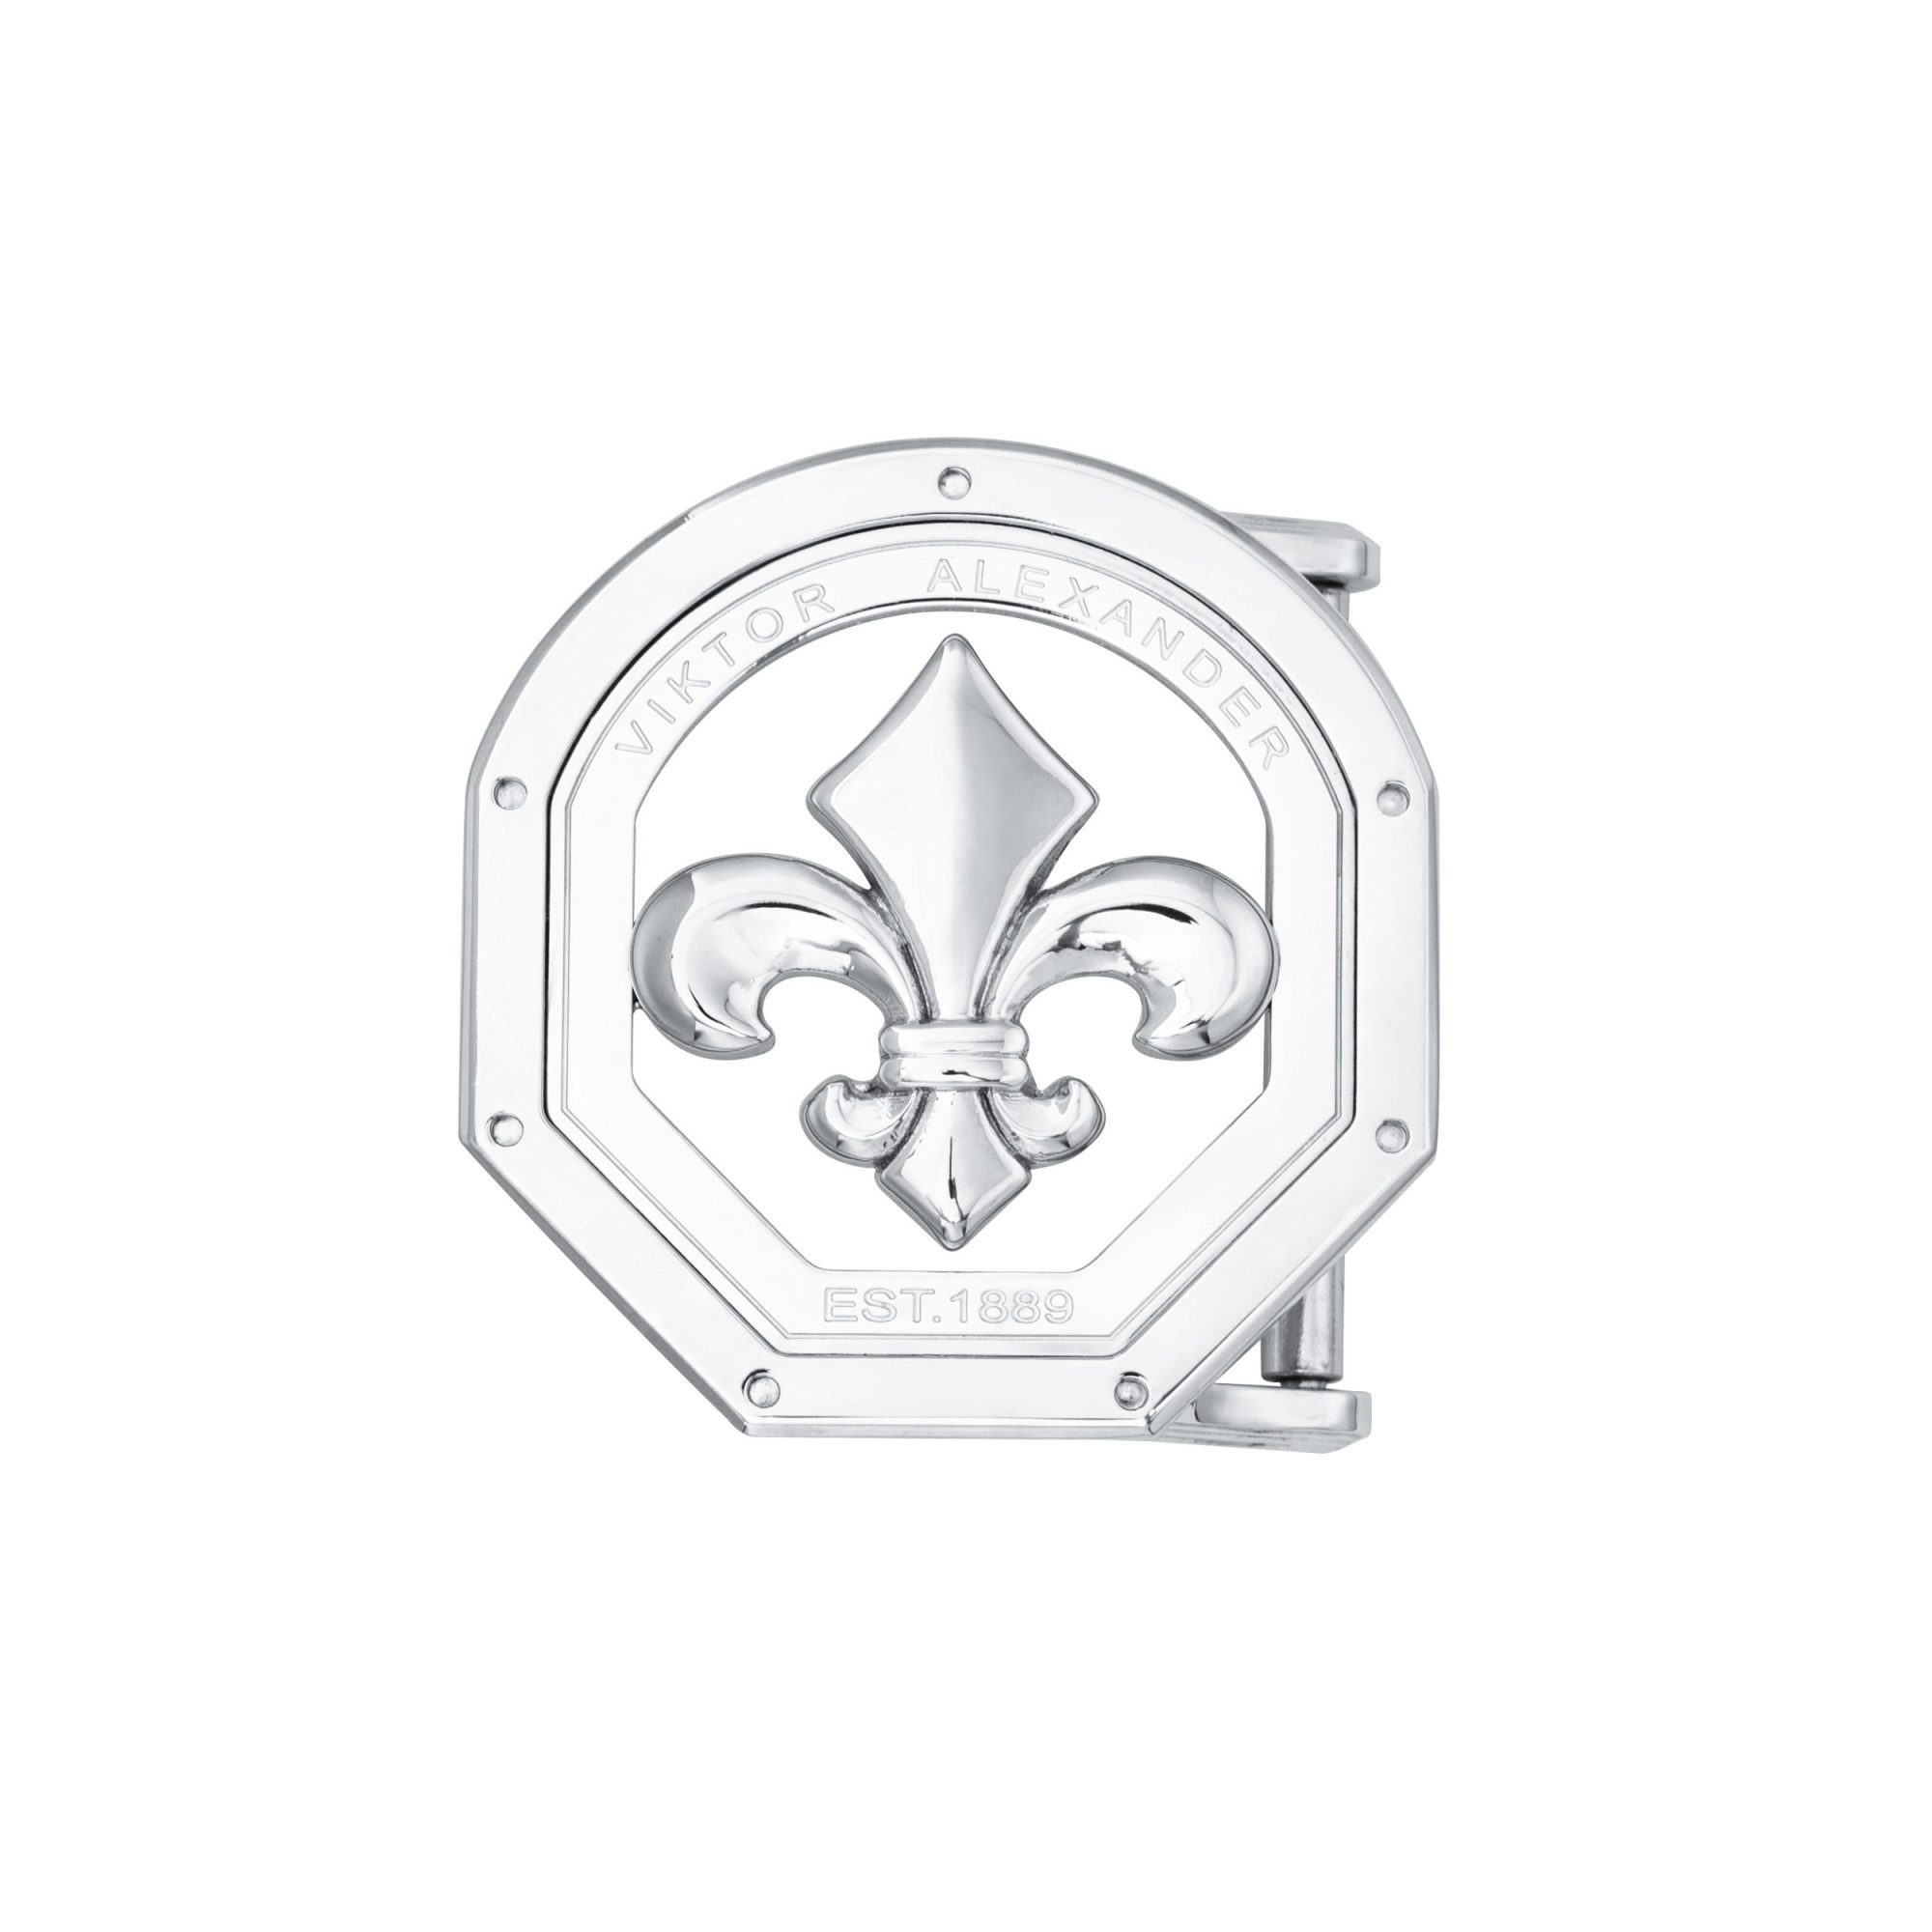 VIKTOR ALEXANDER 38MM STAINLESS STEEL BELT BUCKLE FLEUR DE LIS OFF-SHAPE FRONT PROFILE